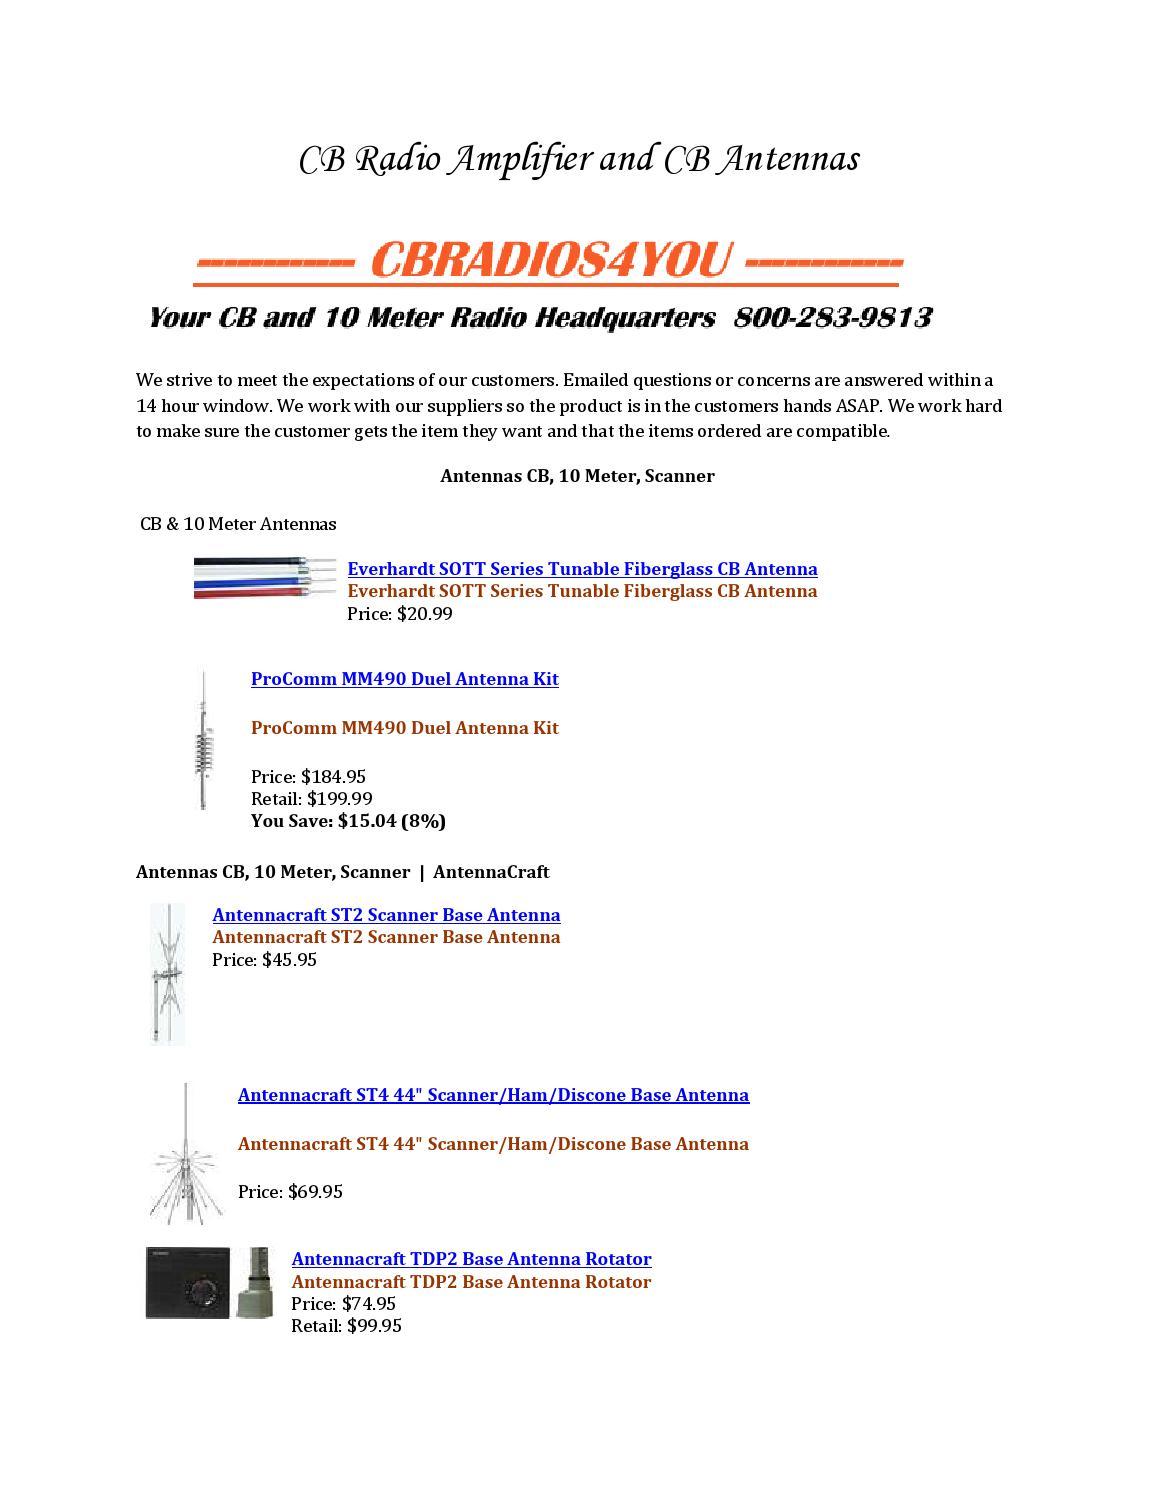 Cb radio amplifier and cb antennas by cbradios4you - issuu